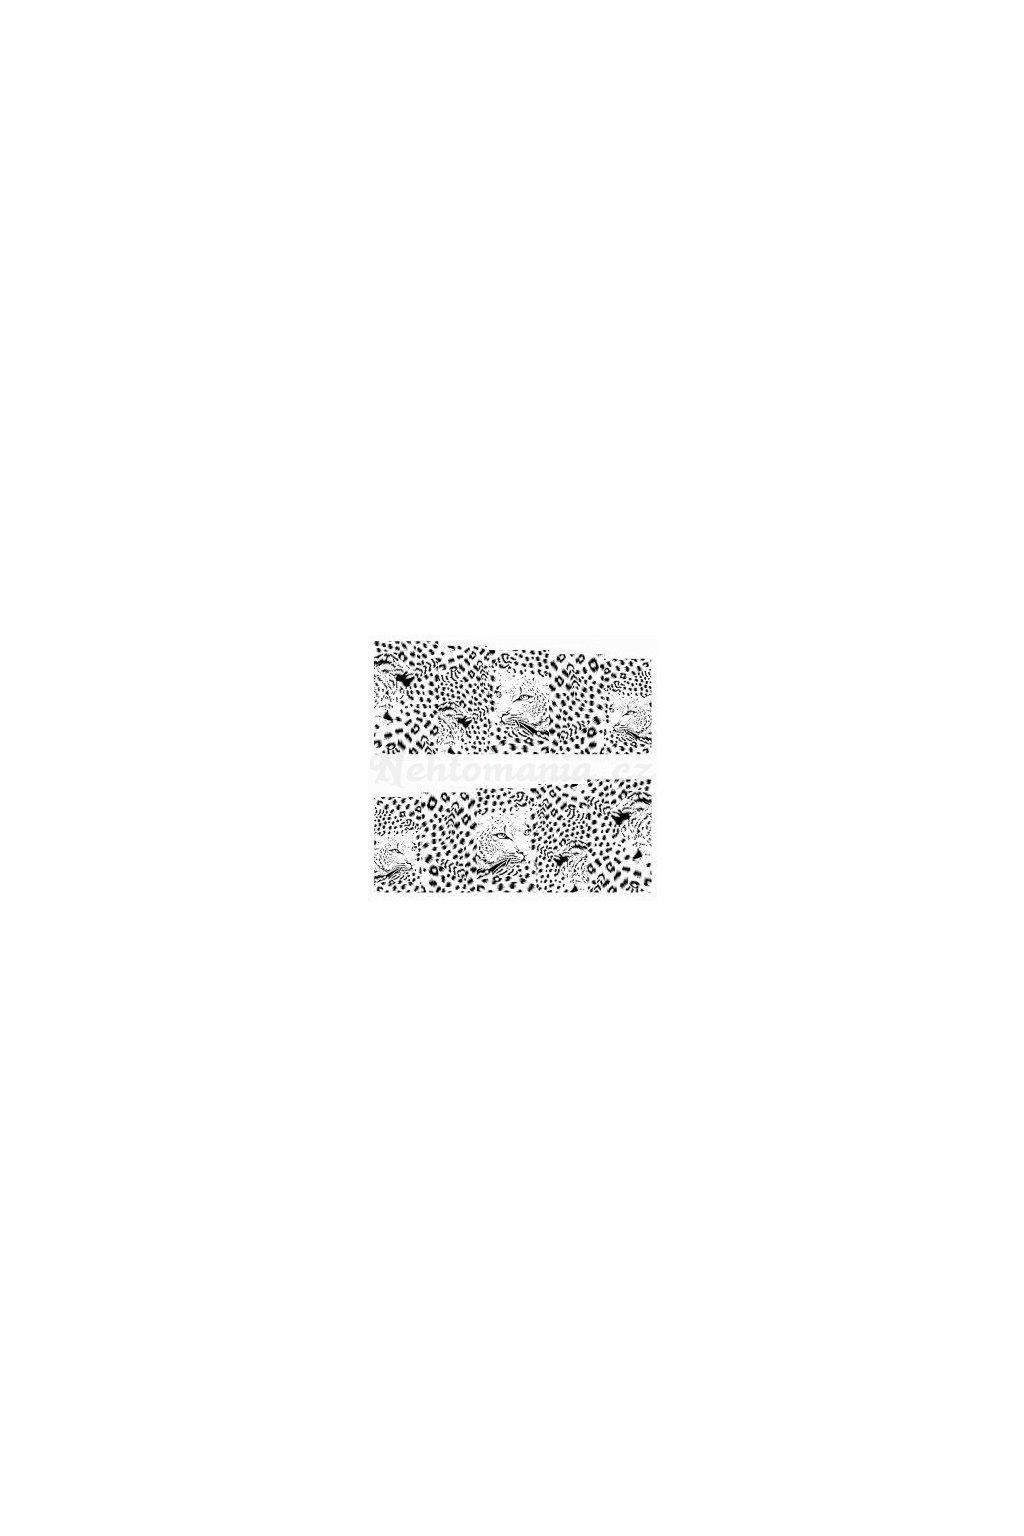 22988 vodolepka c 27